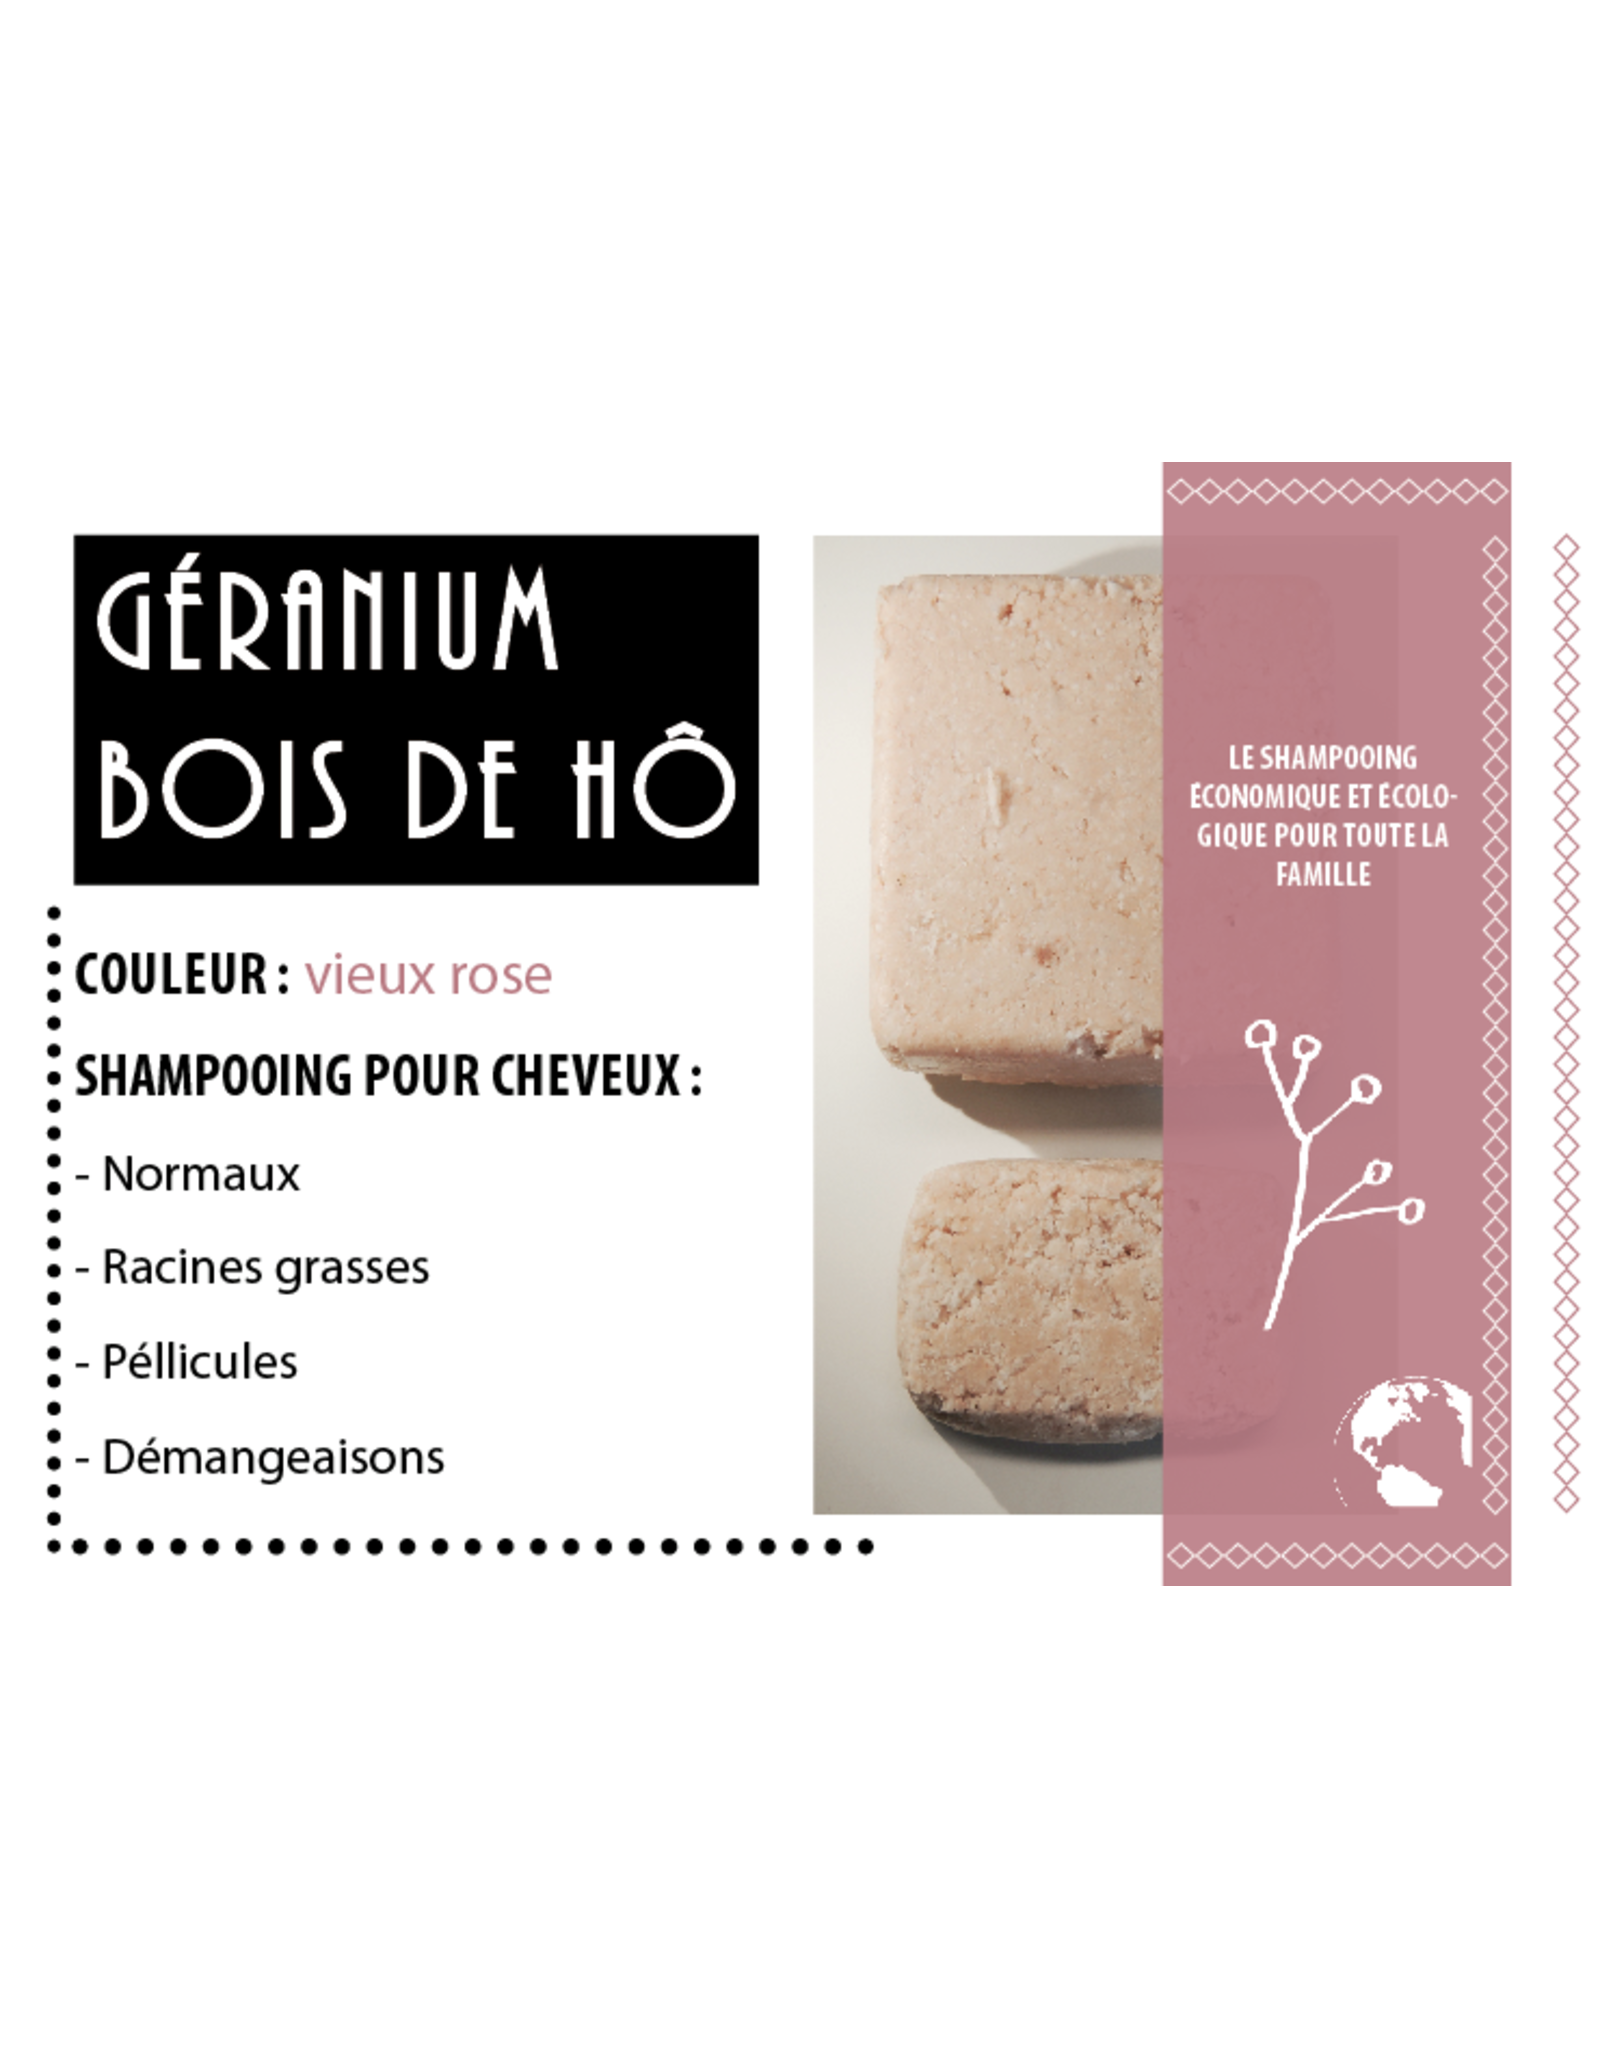 K'rolo Cosmetics Shampoing solide Géranium-Bois de Hô